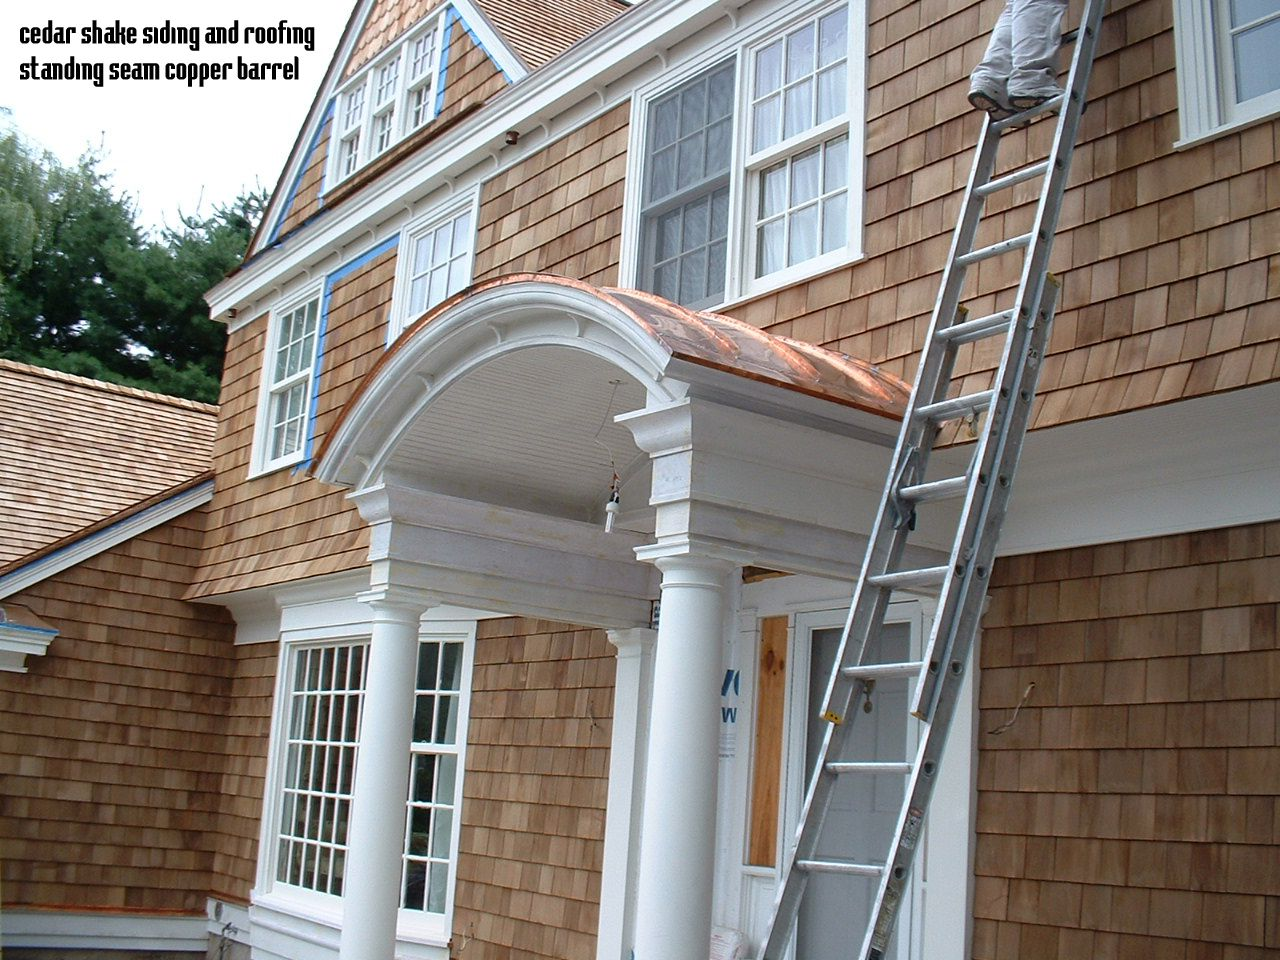 Copper Barrel Roof Cedar Shingle Cedar Siding